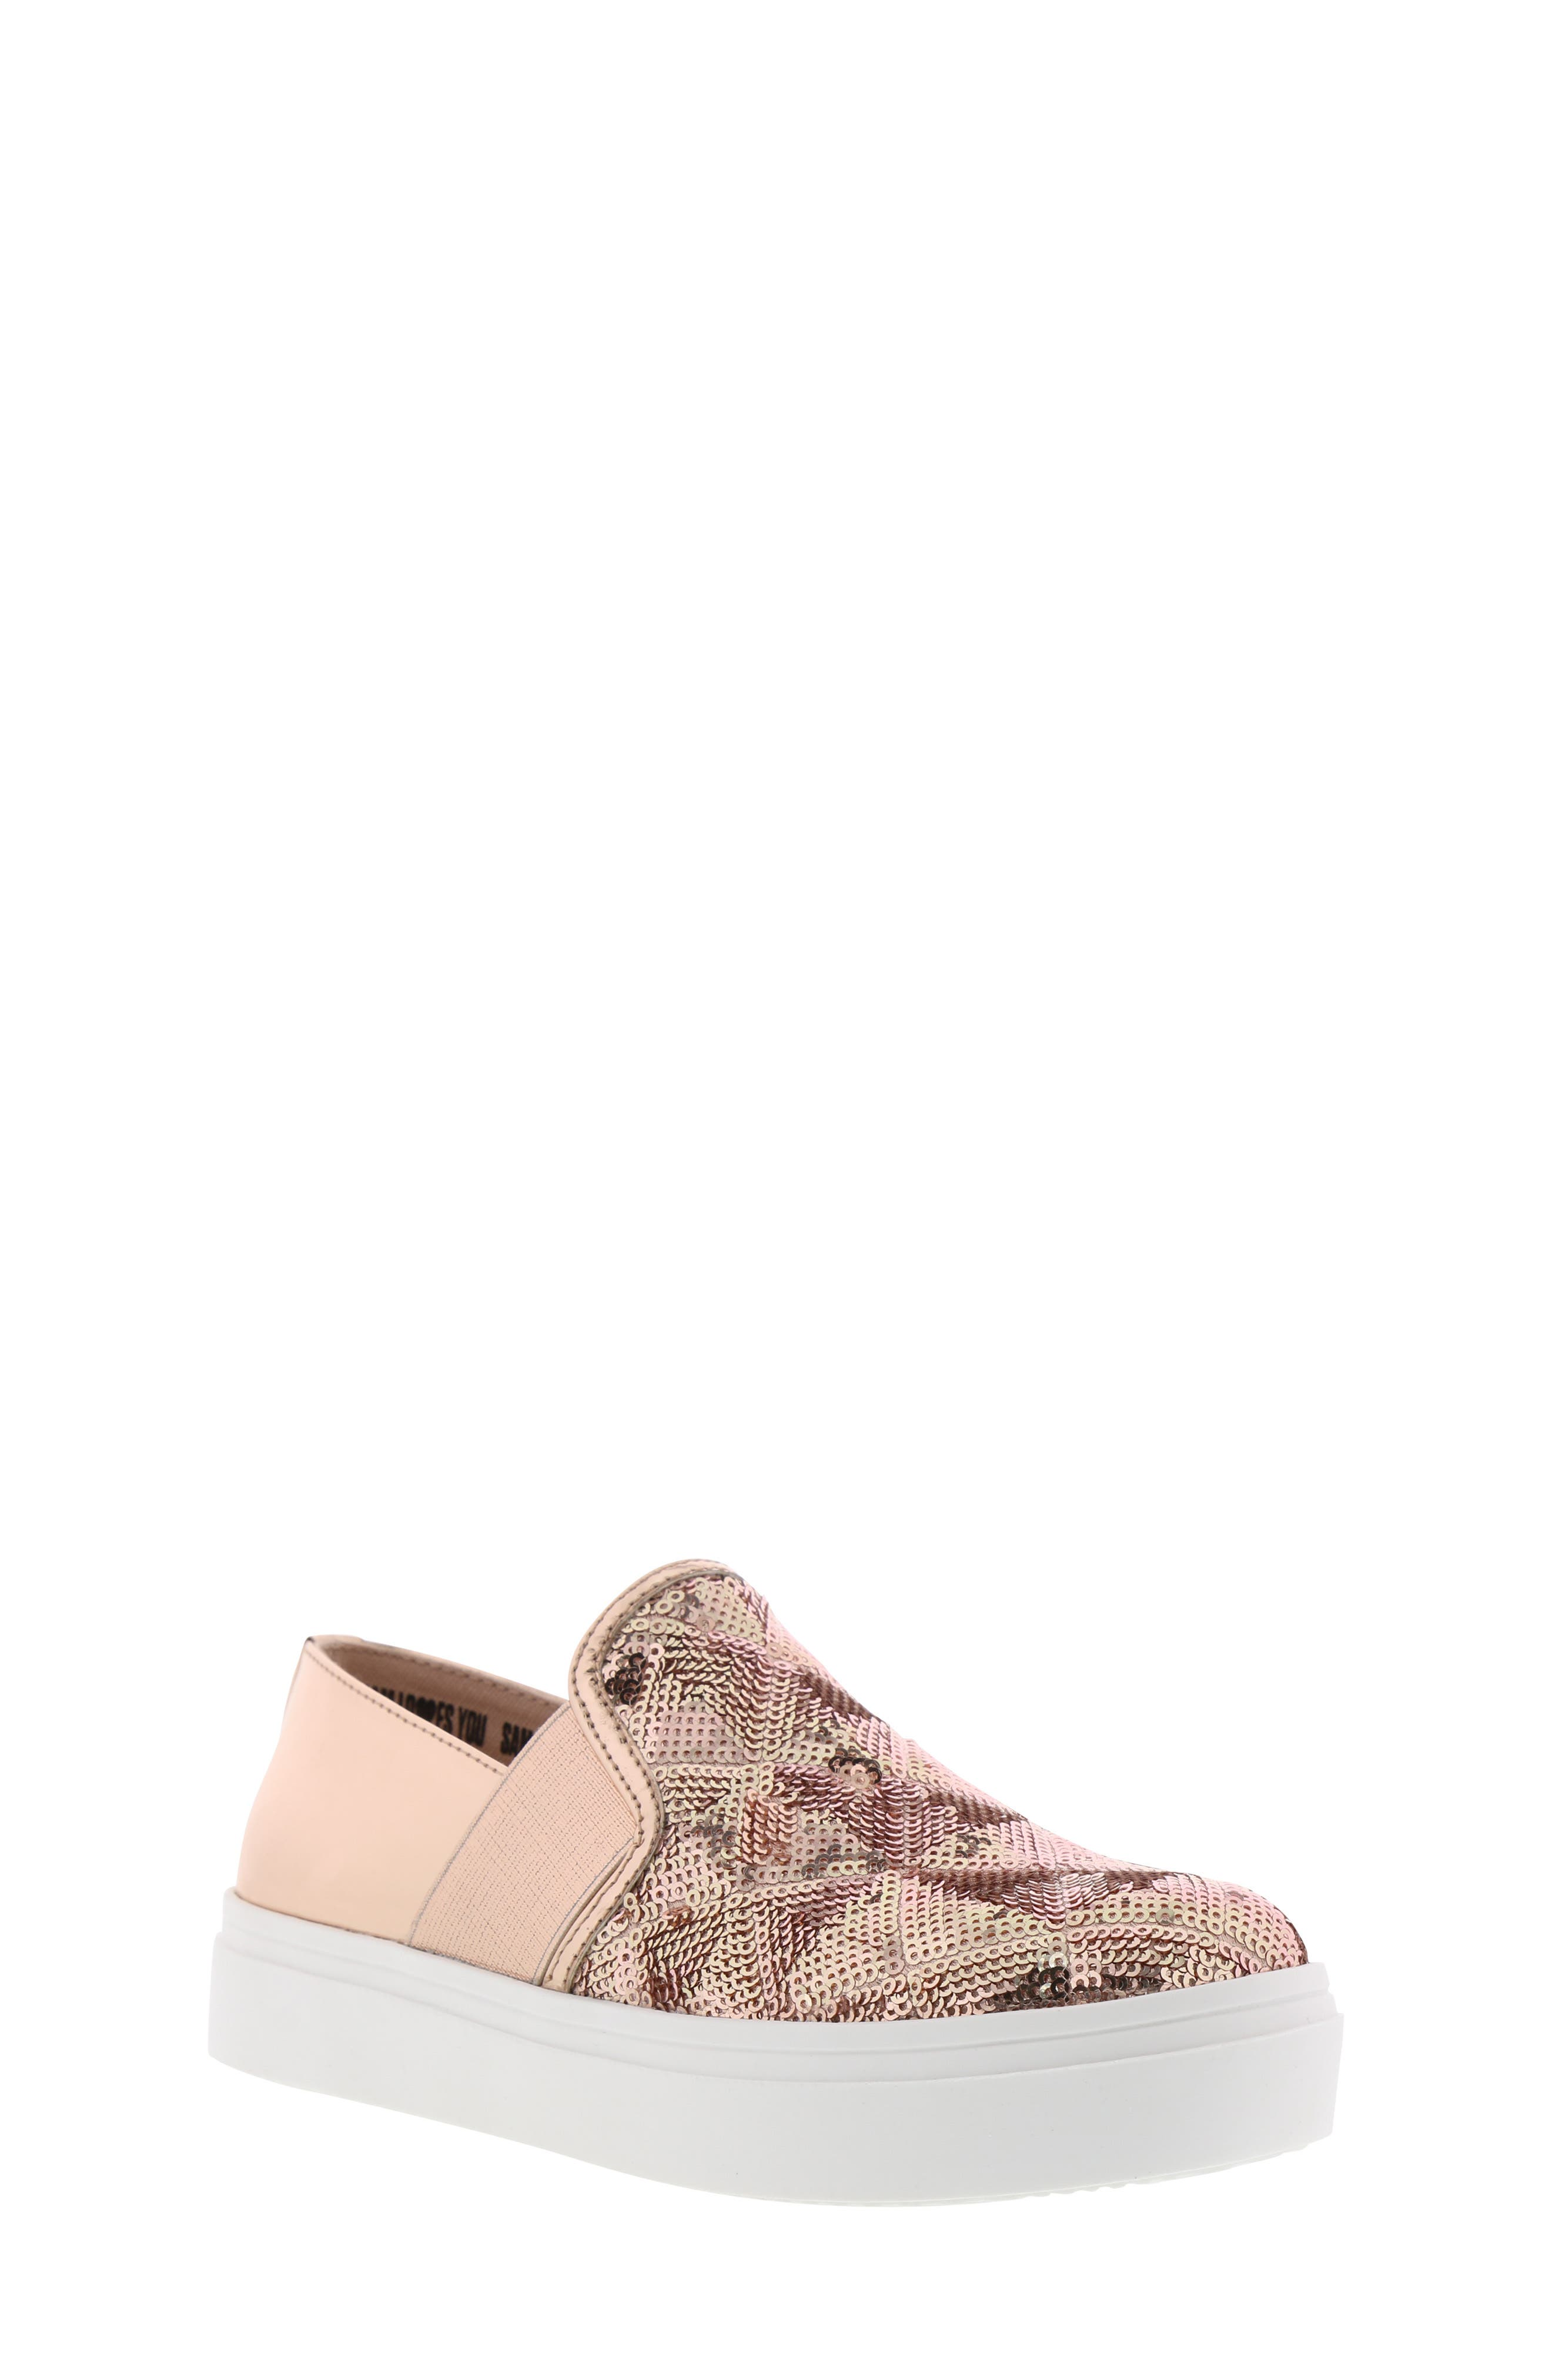 Sheena Pam Sequin Sneaker,                             Main thumbnail 1, color,                             ROSE GOLD